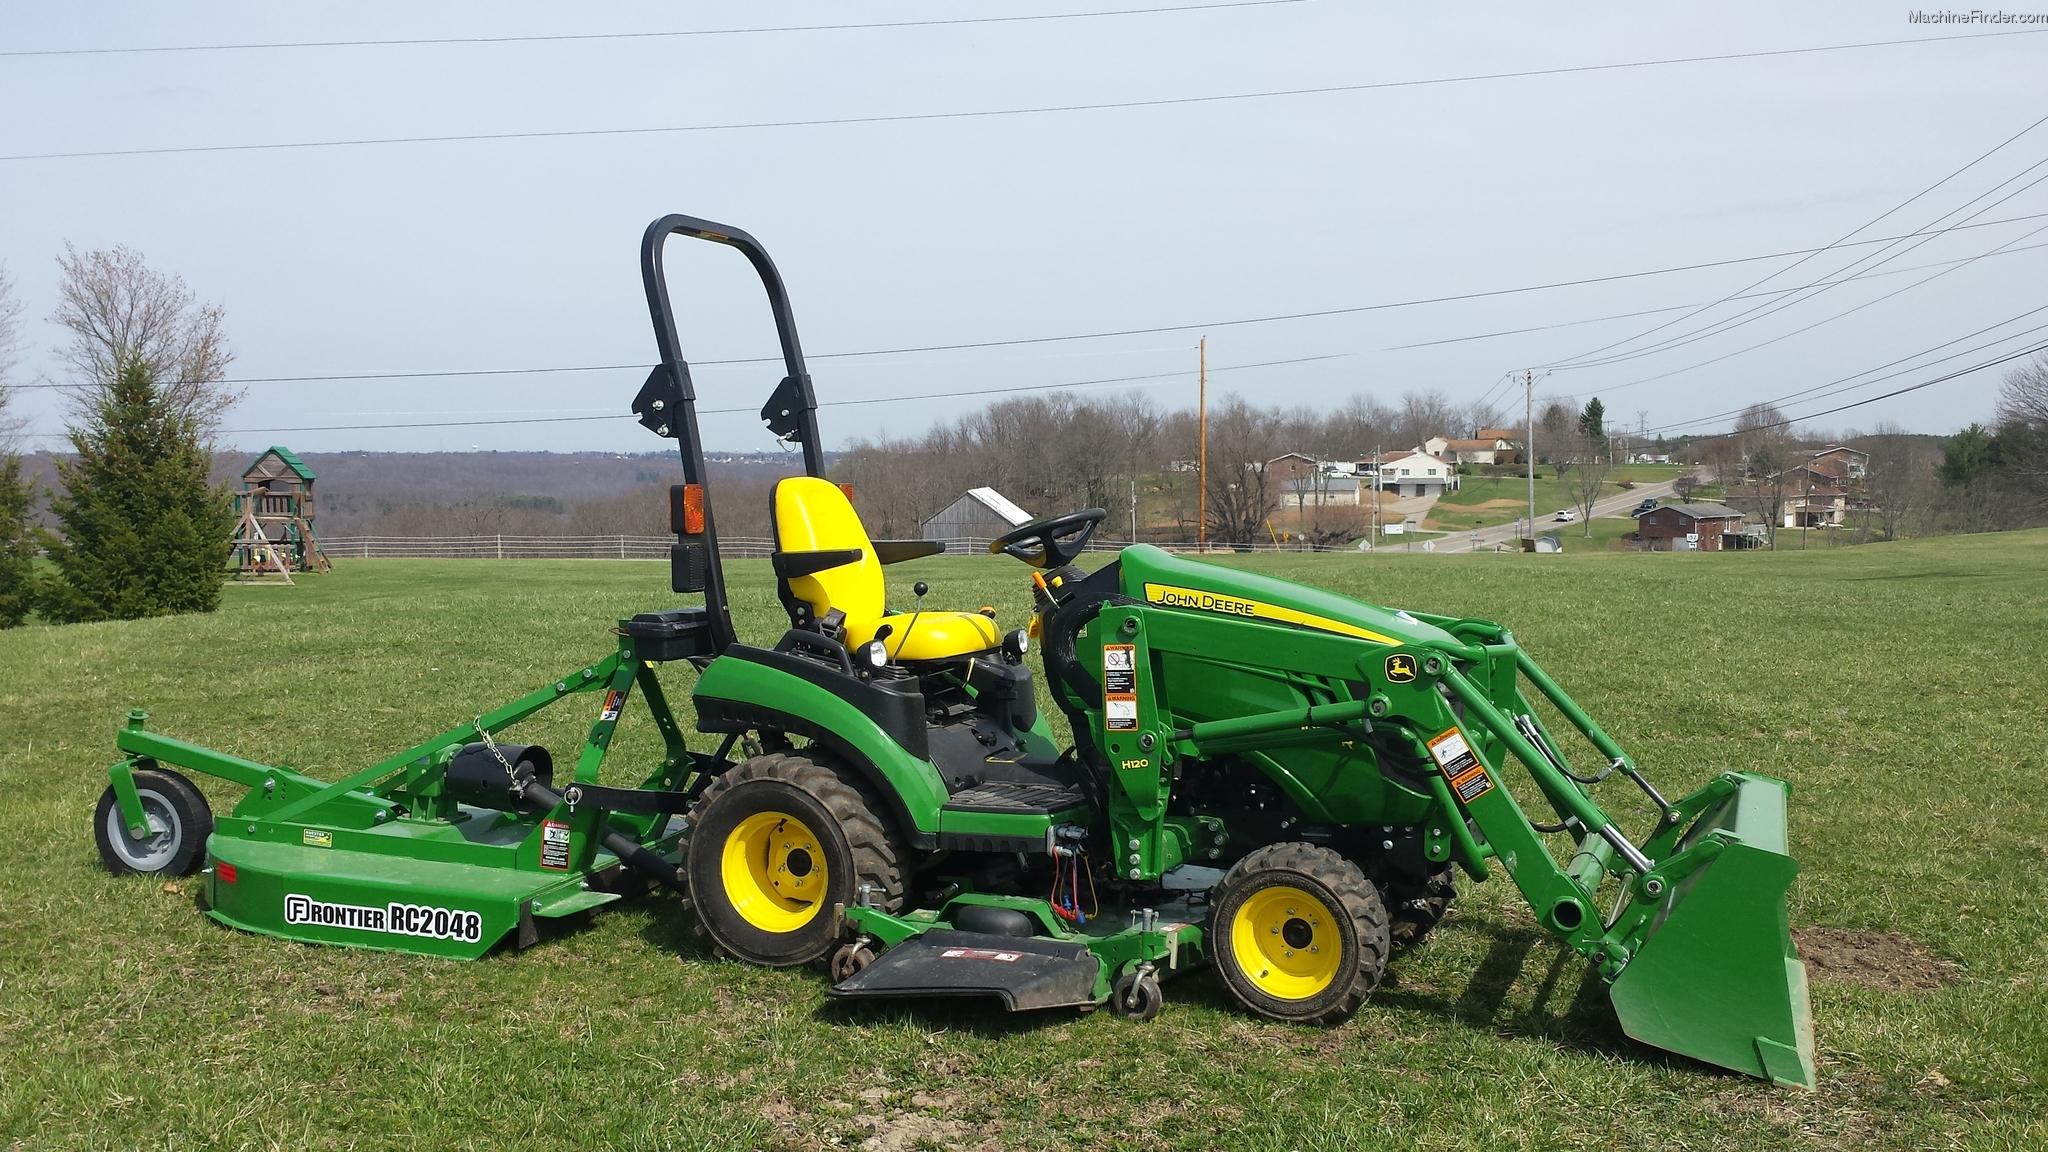 2013 John Deere 1025R Tractors - Compact (1-40hp.) - John ...